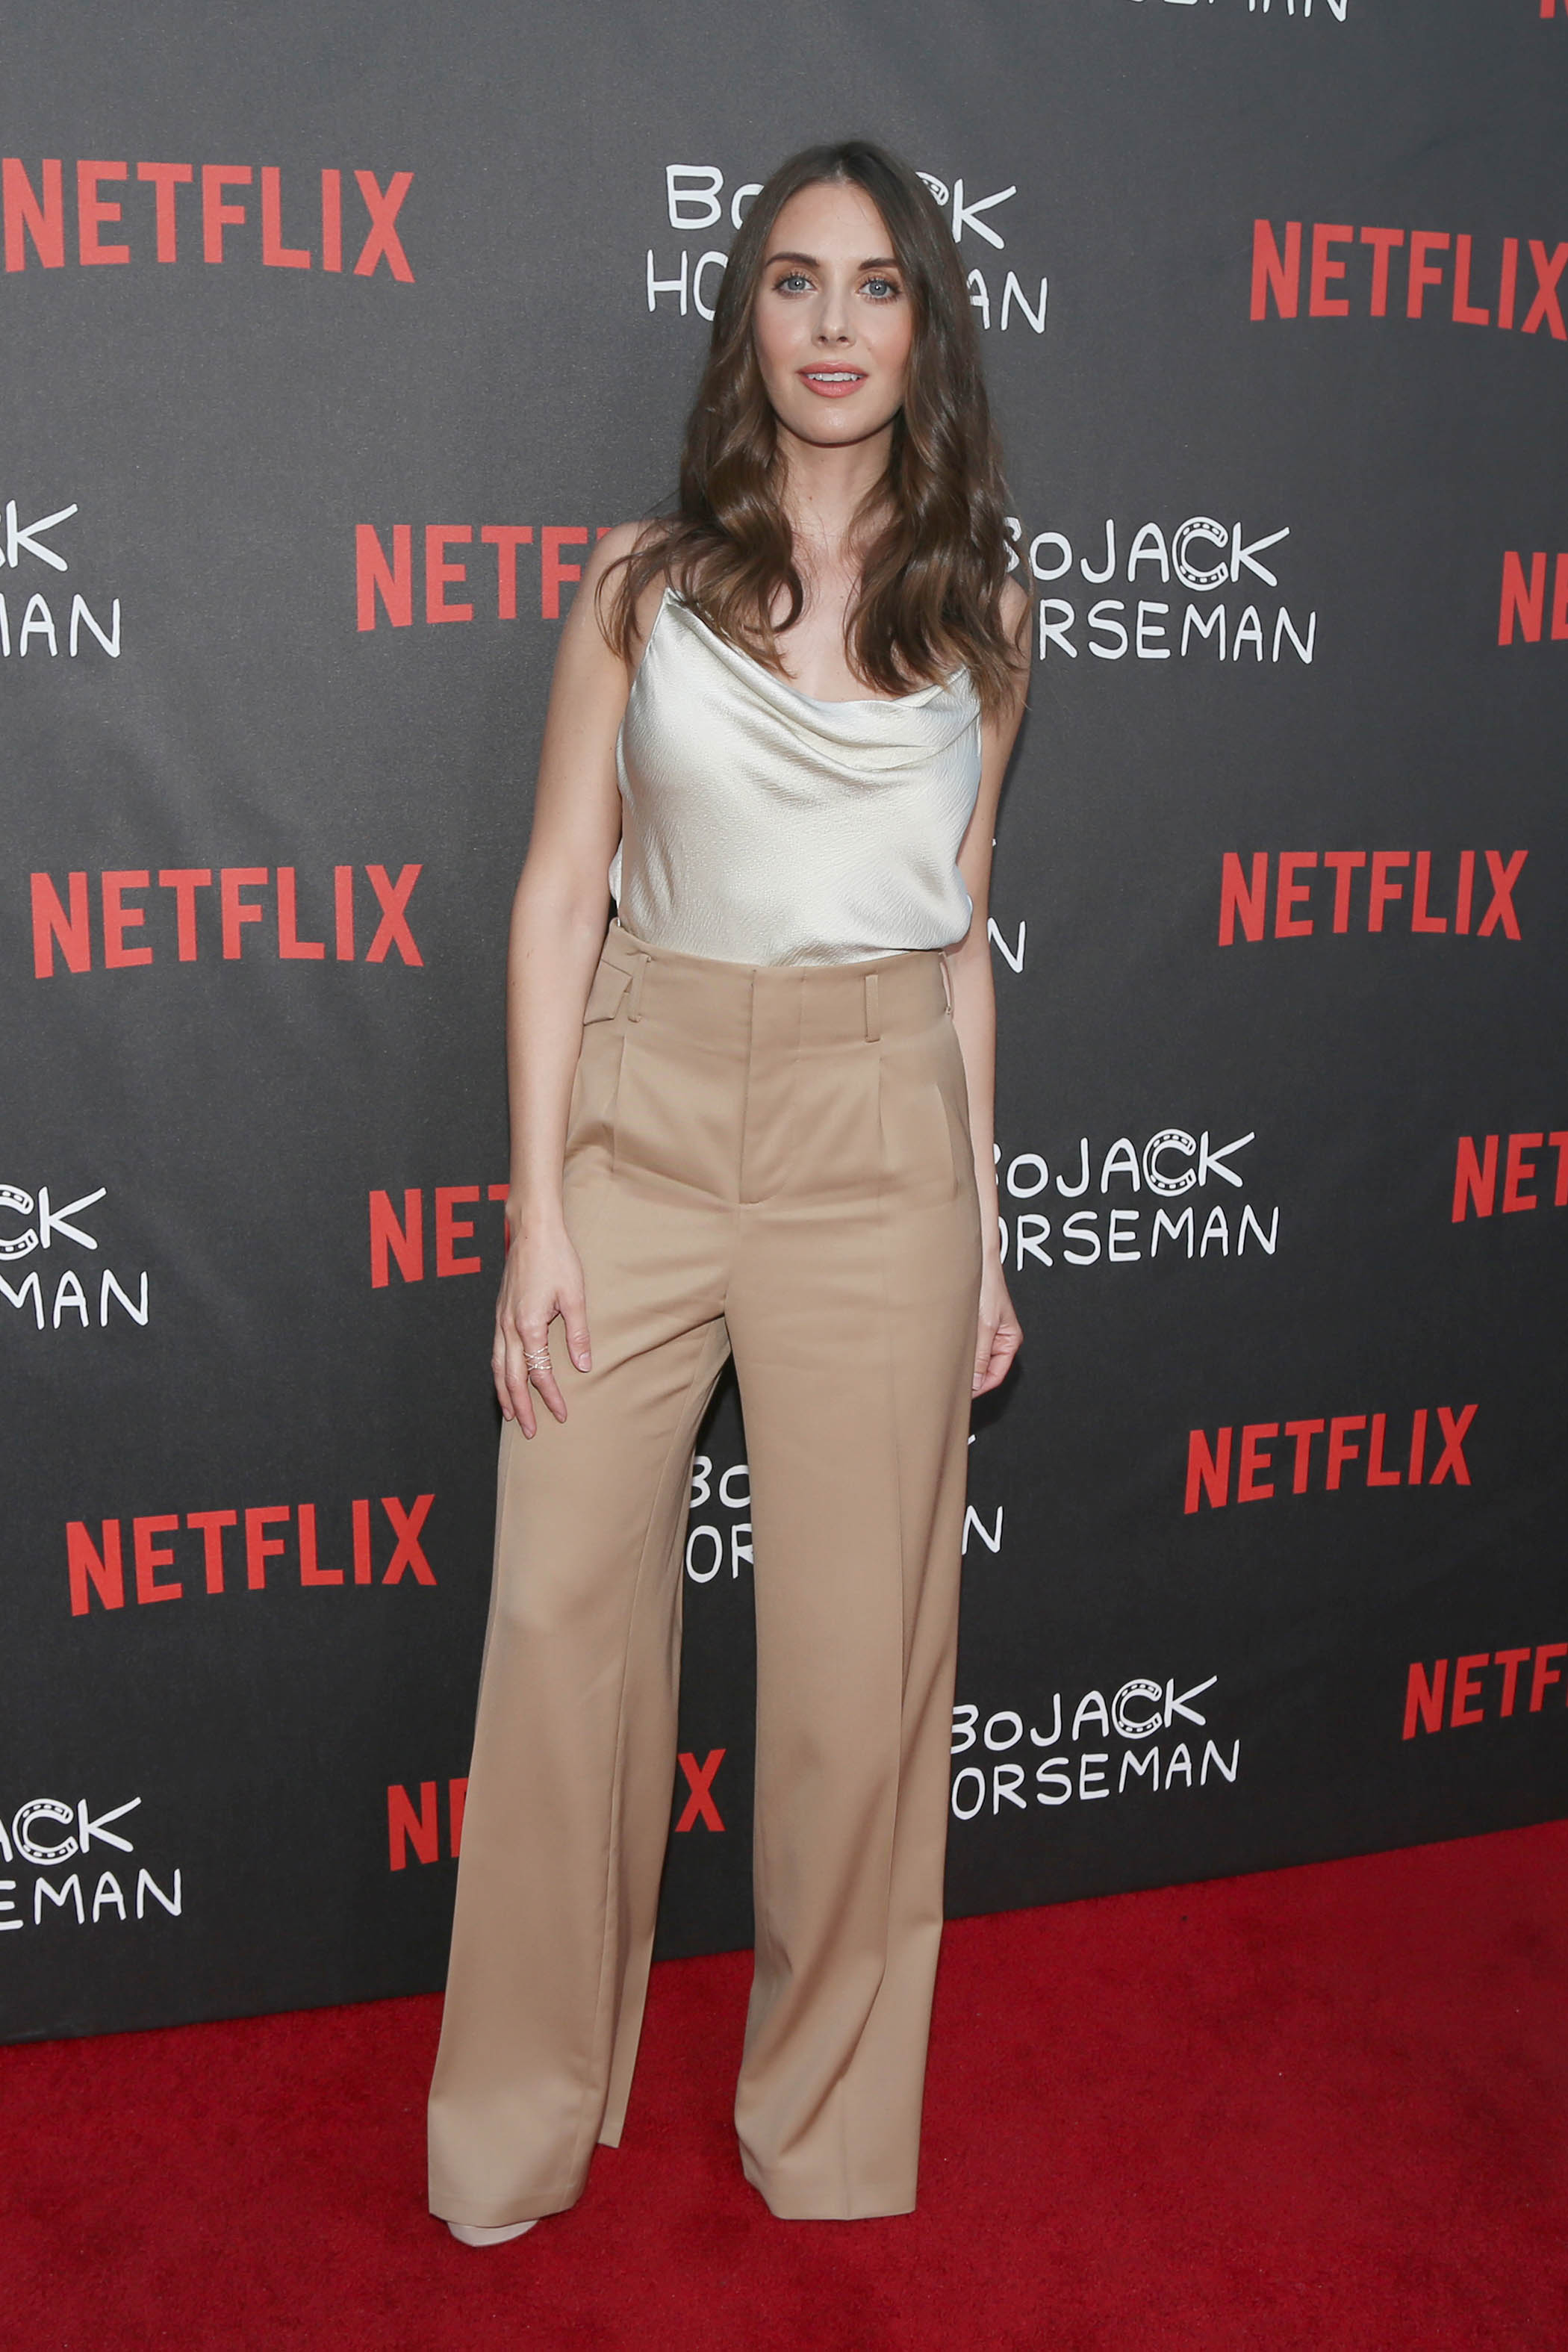 Alison Brie Bojack Horseman Special Screening 2 - Satiny